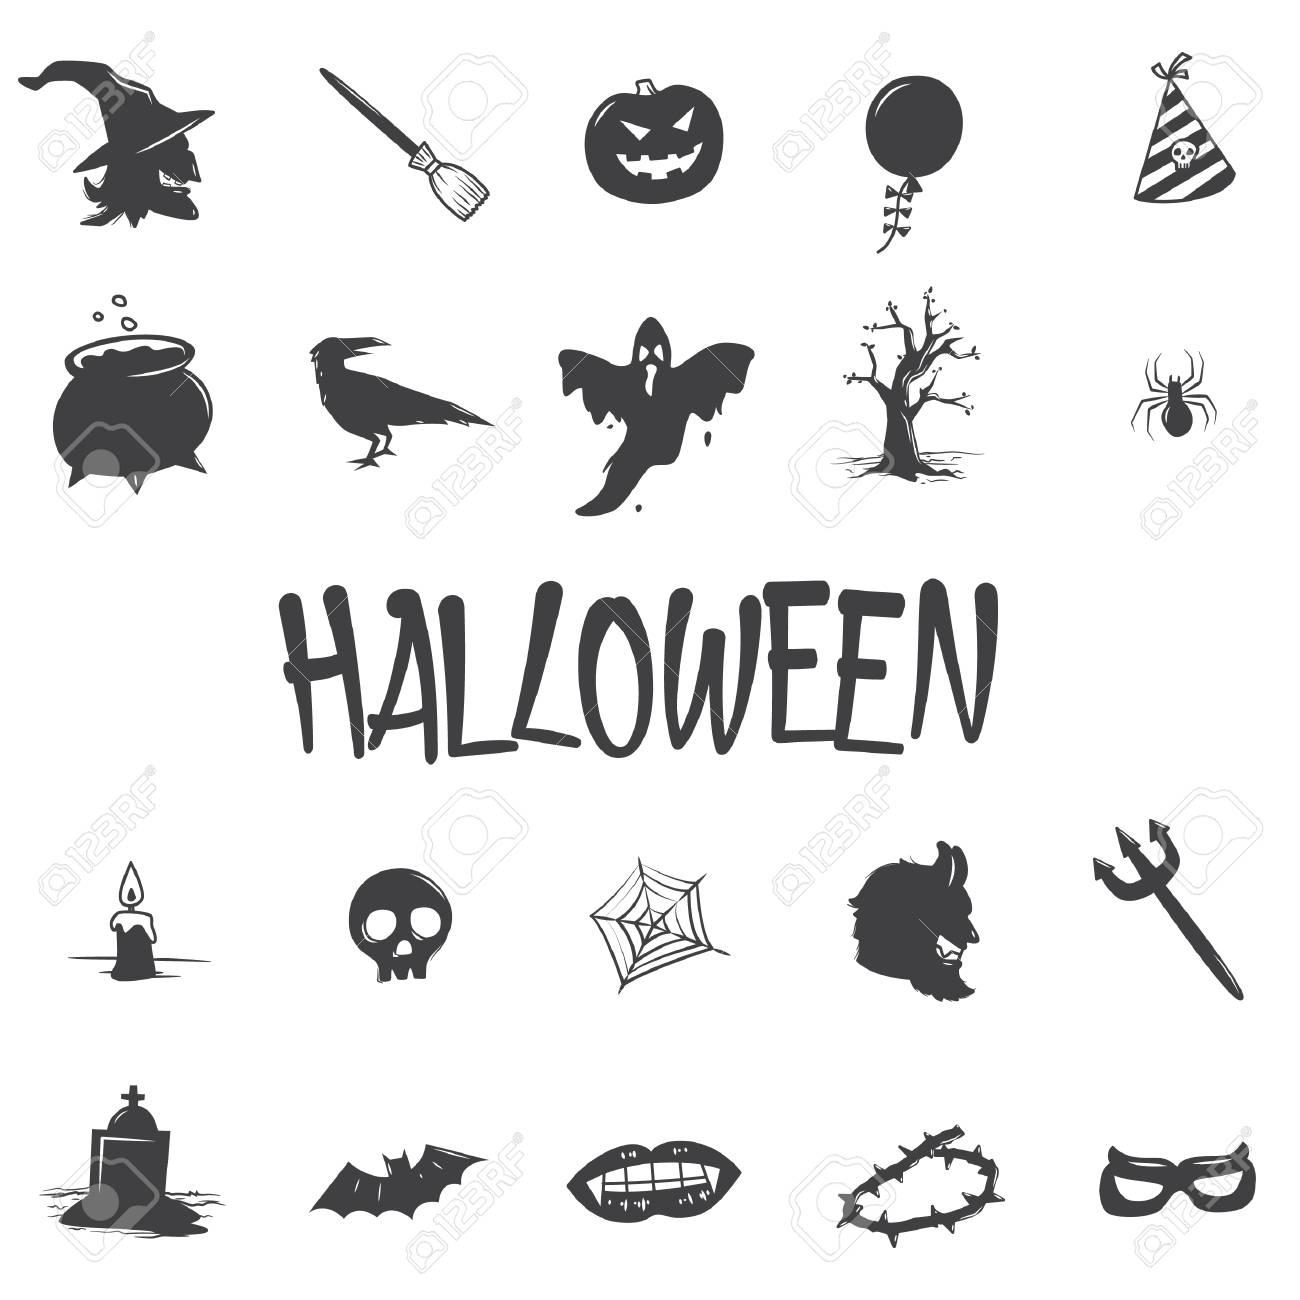 set of halloween icons - 106672609